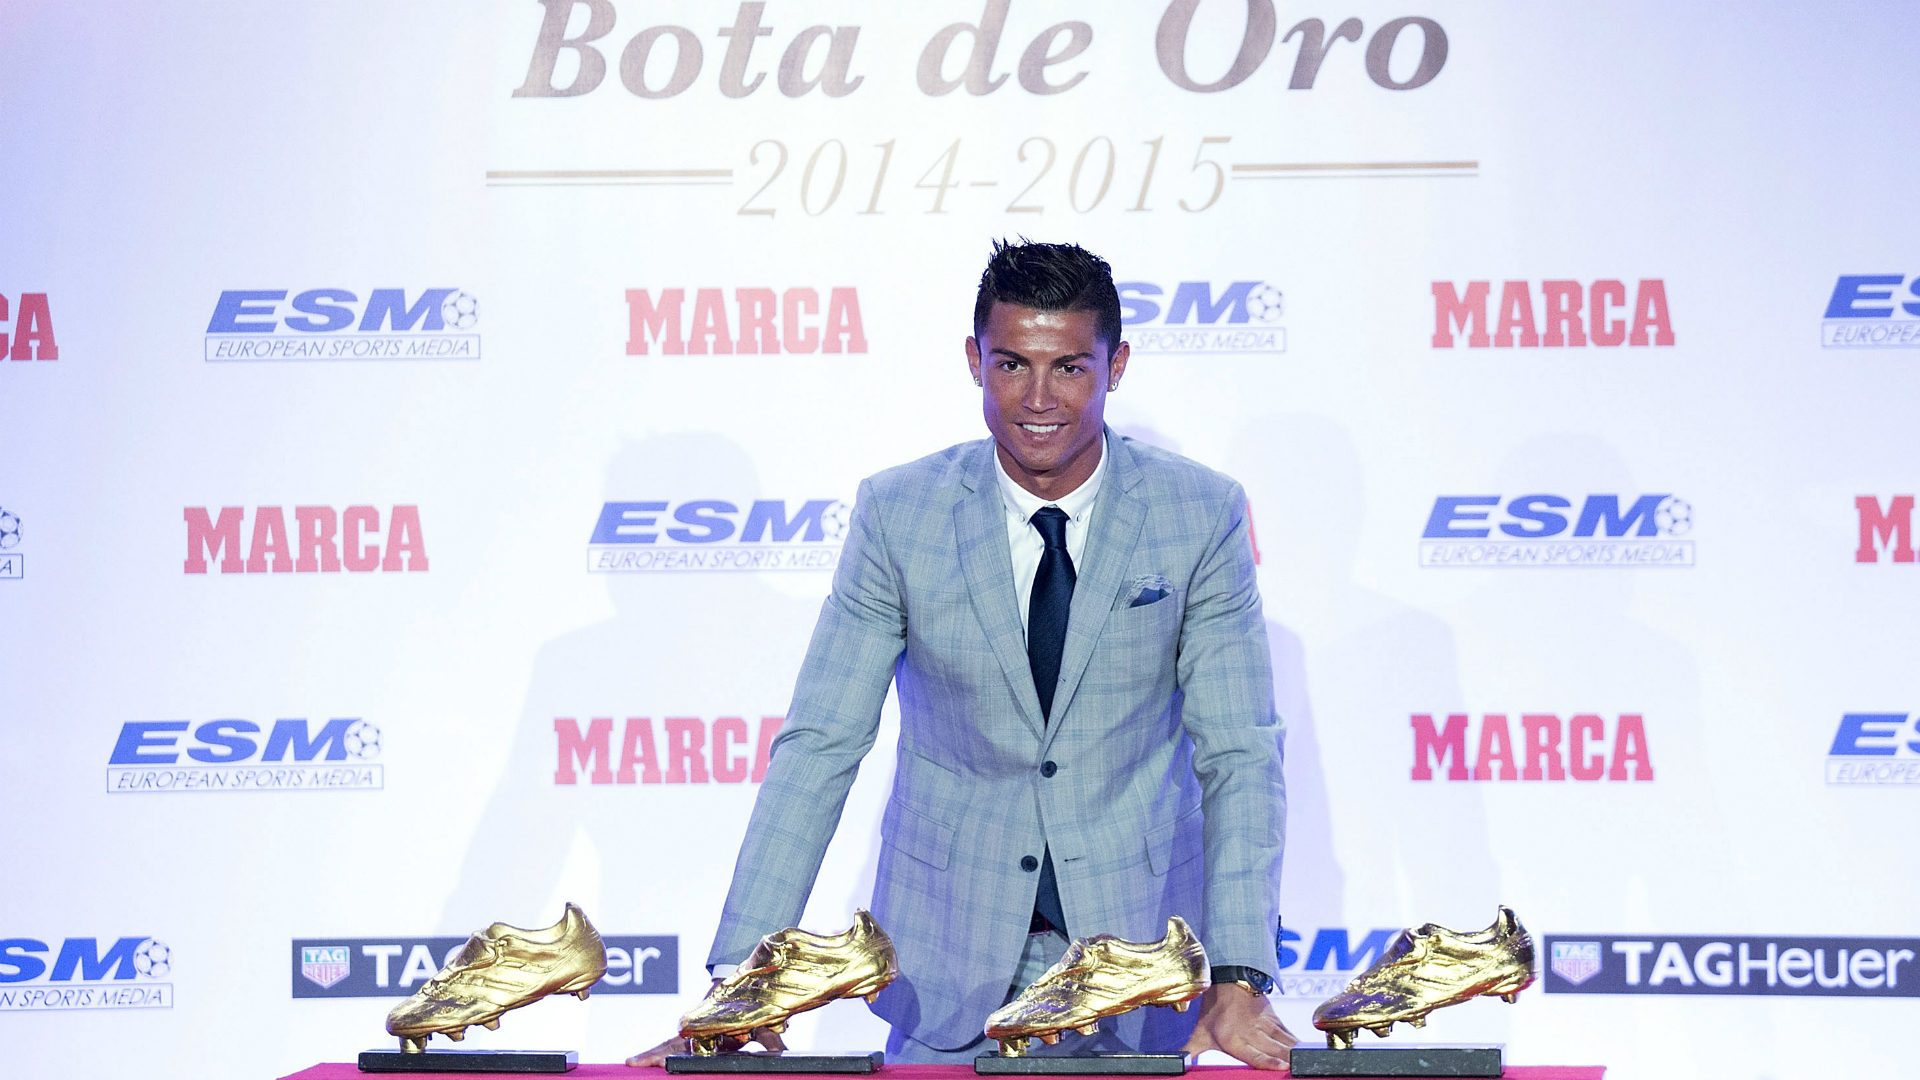 Cristiano Ronaldo: Golden Shoe better